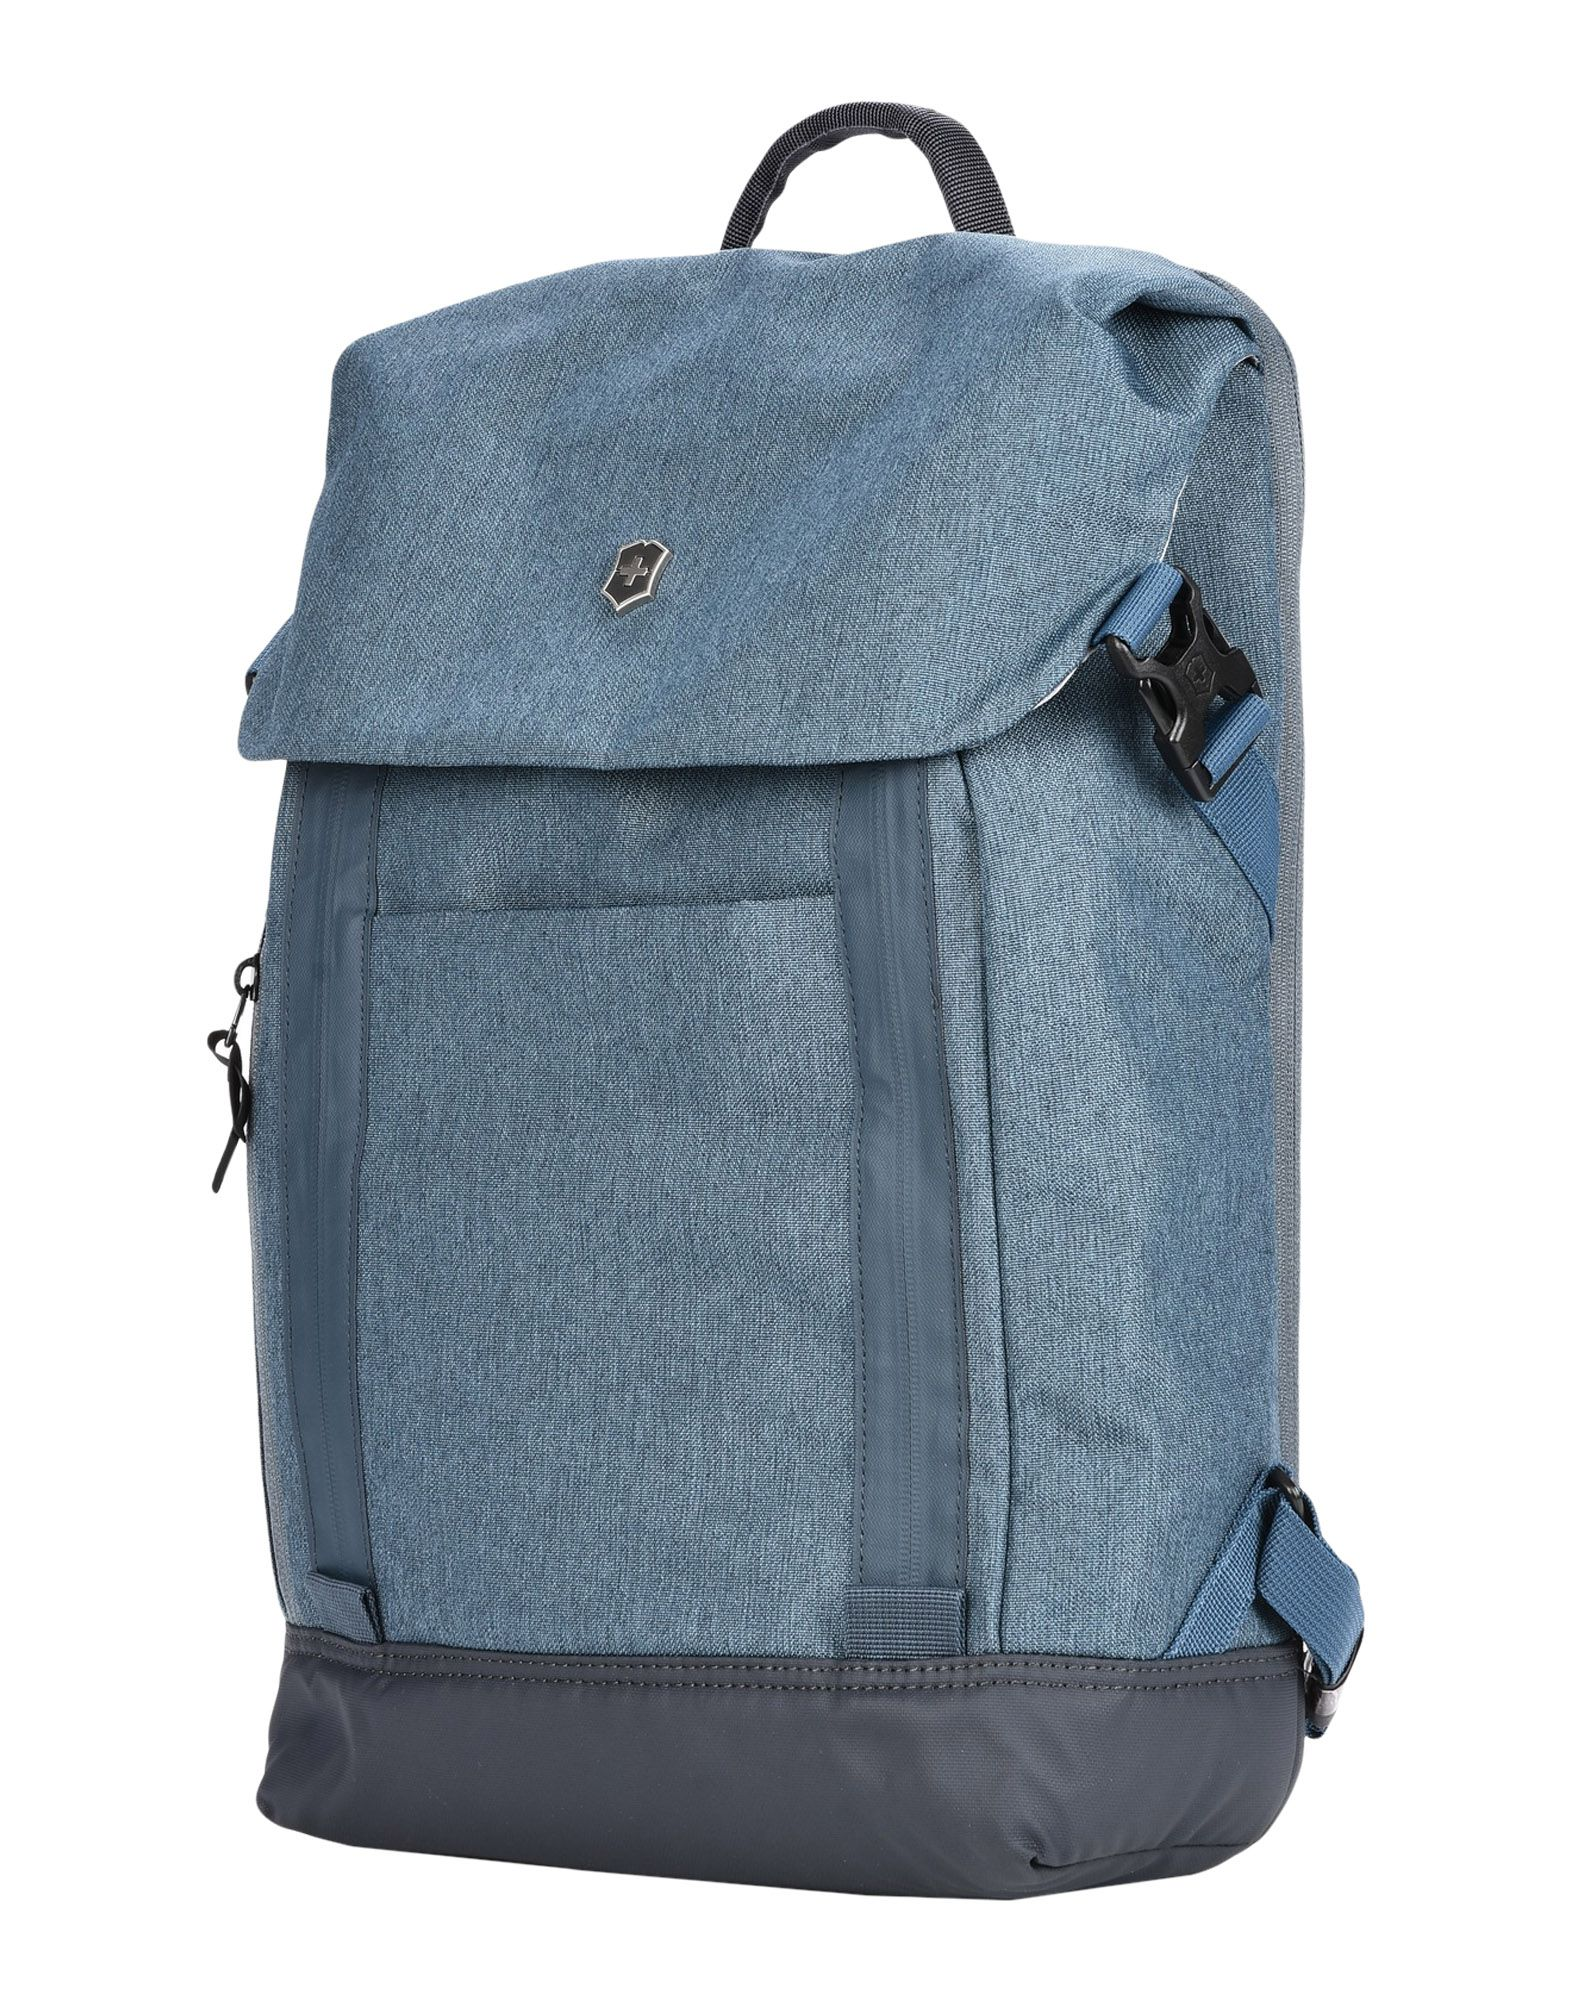 Zaini & Marsupi Victorinox Altmont Classic Deluxe Flapover Laptop Backpack - Uomo - Acquista online su